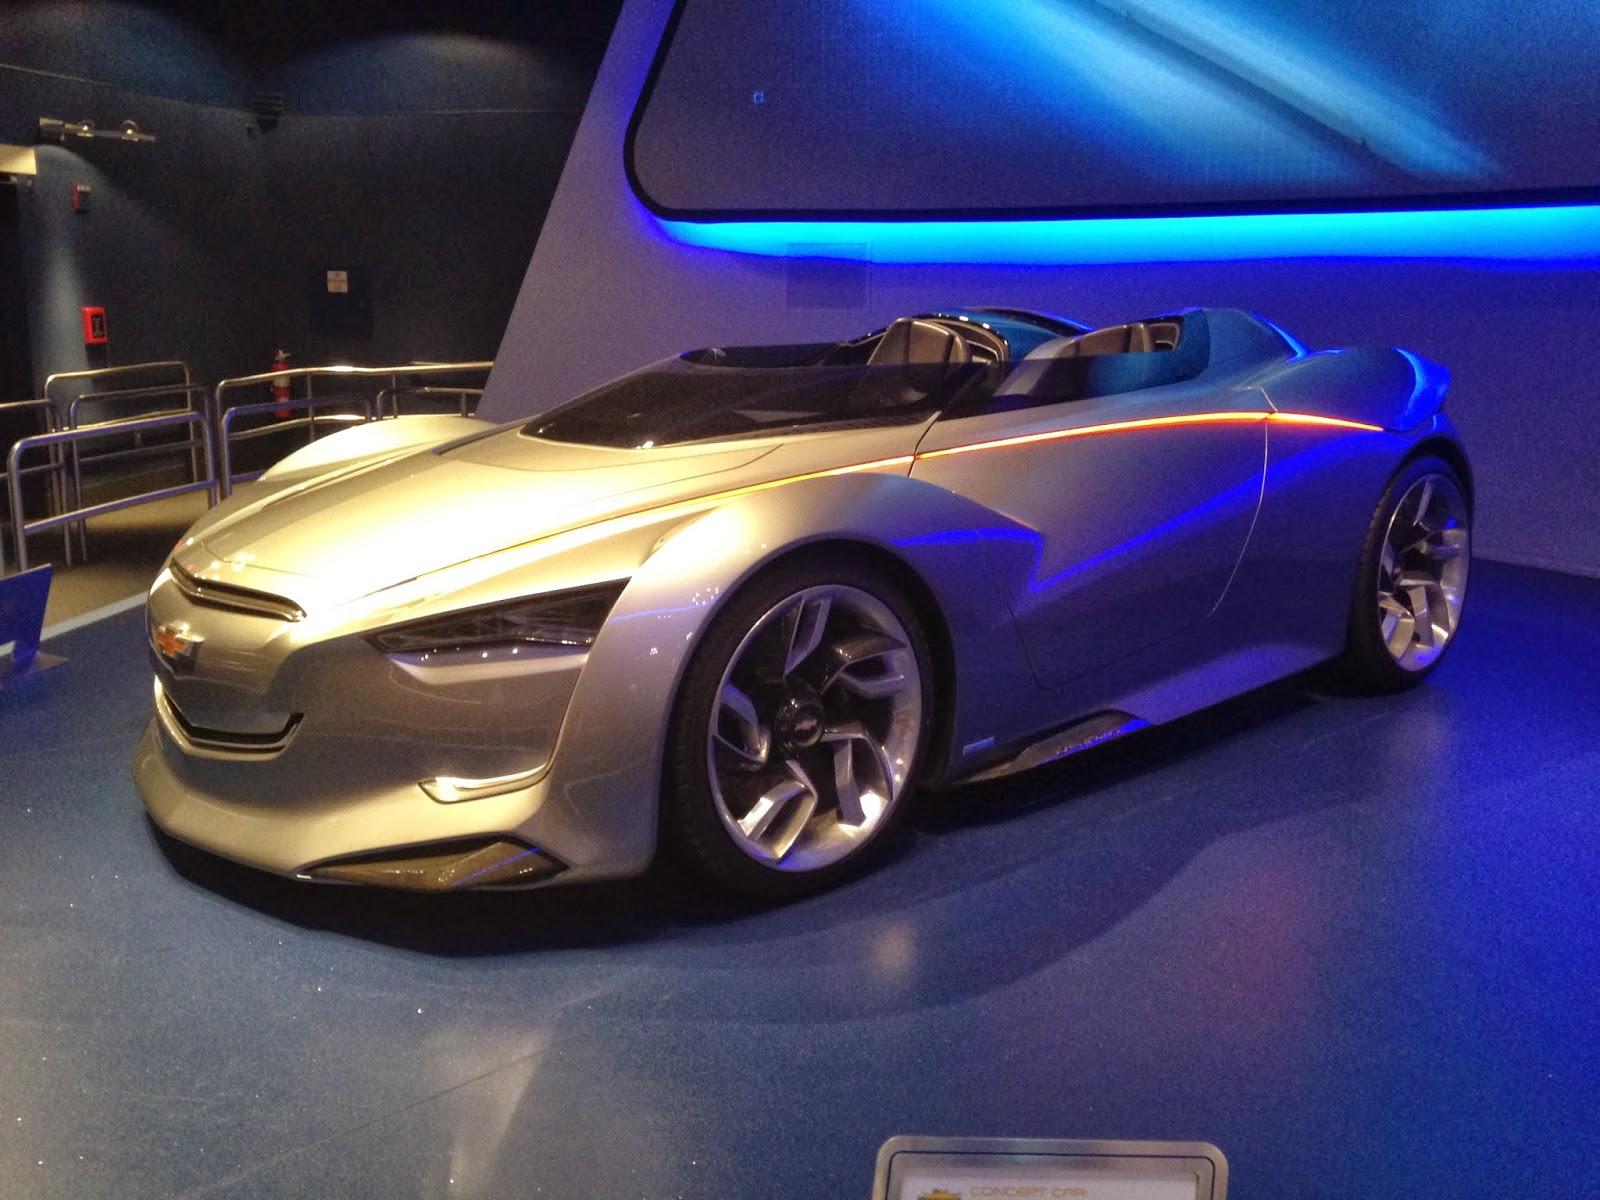 Hoselton Auto Mall: Chevrolet Miray Concept Car